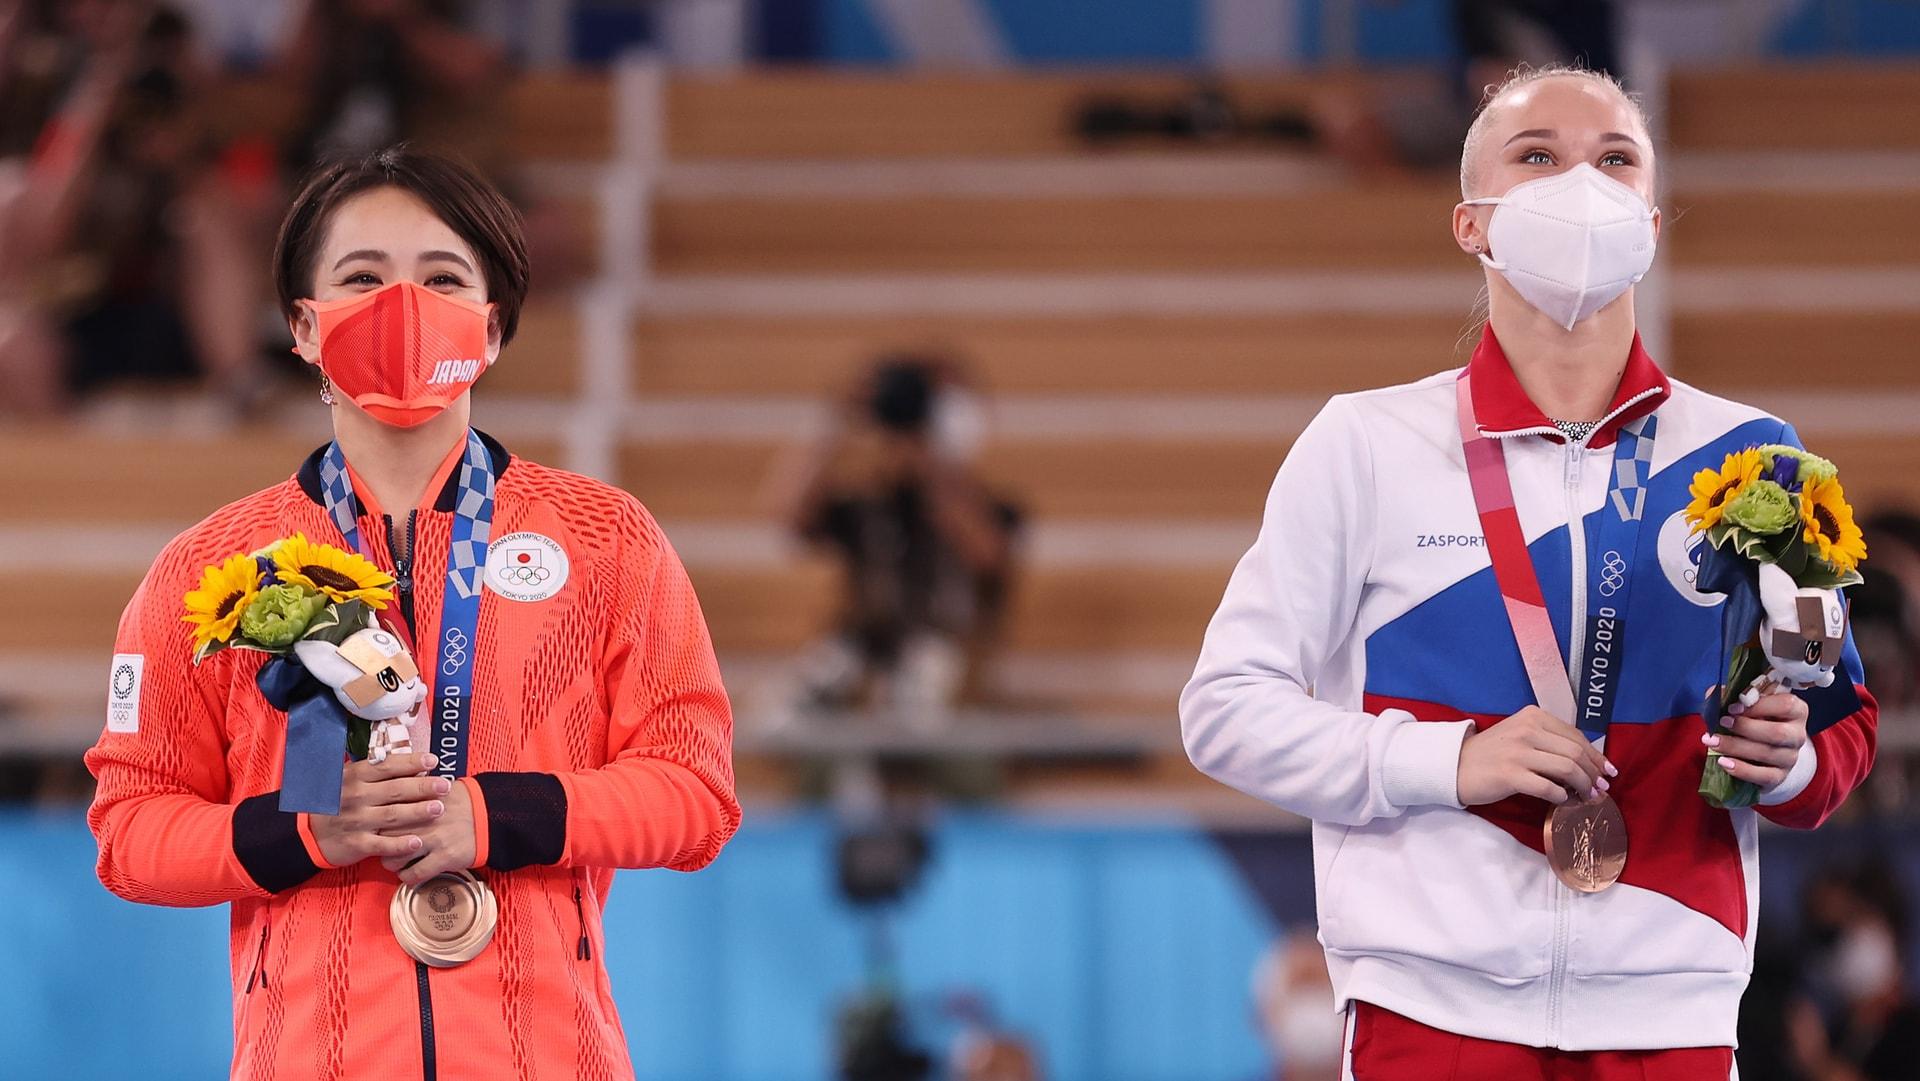 Image for A bronze for both: Murakami, Melnikova tie for third in floor exercise final